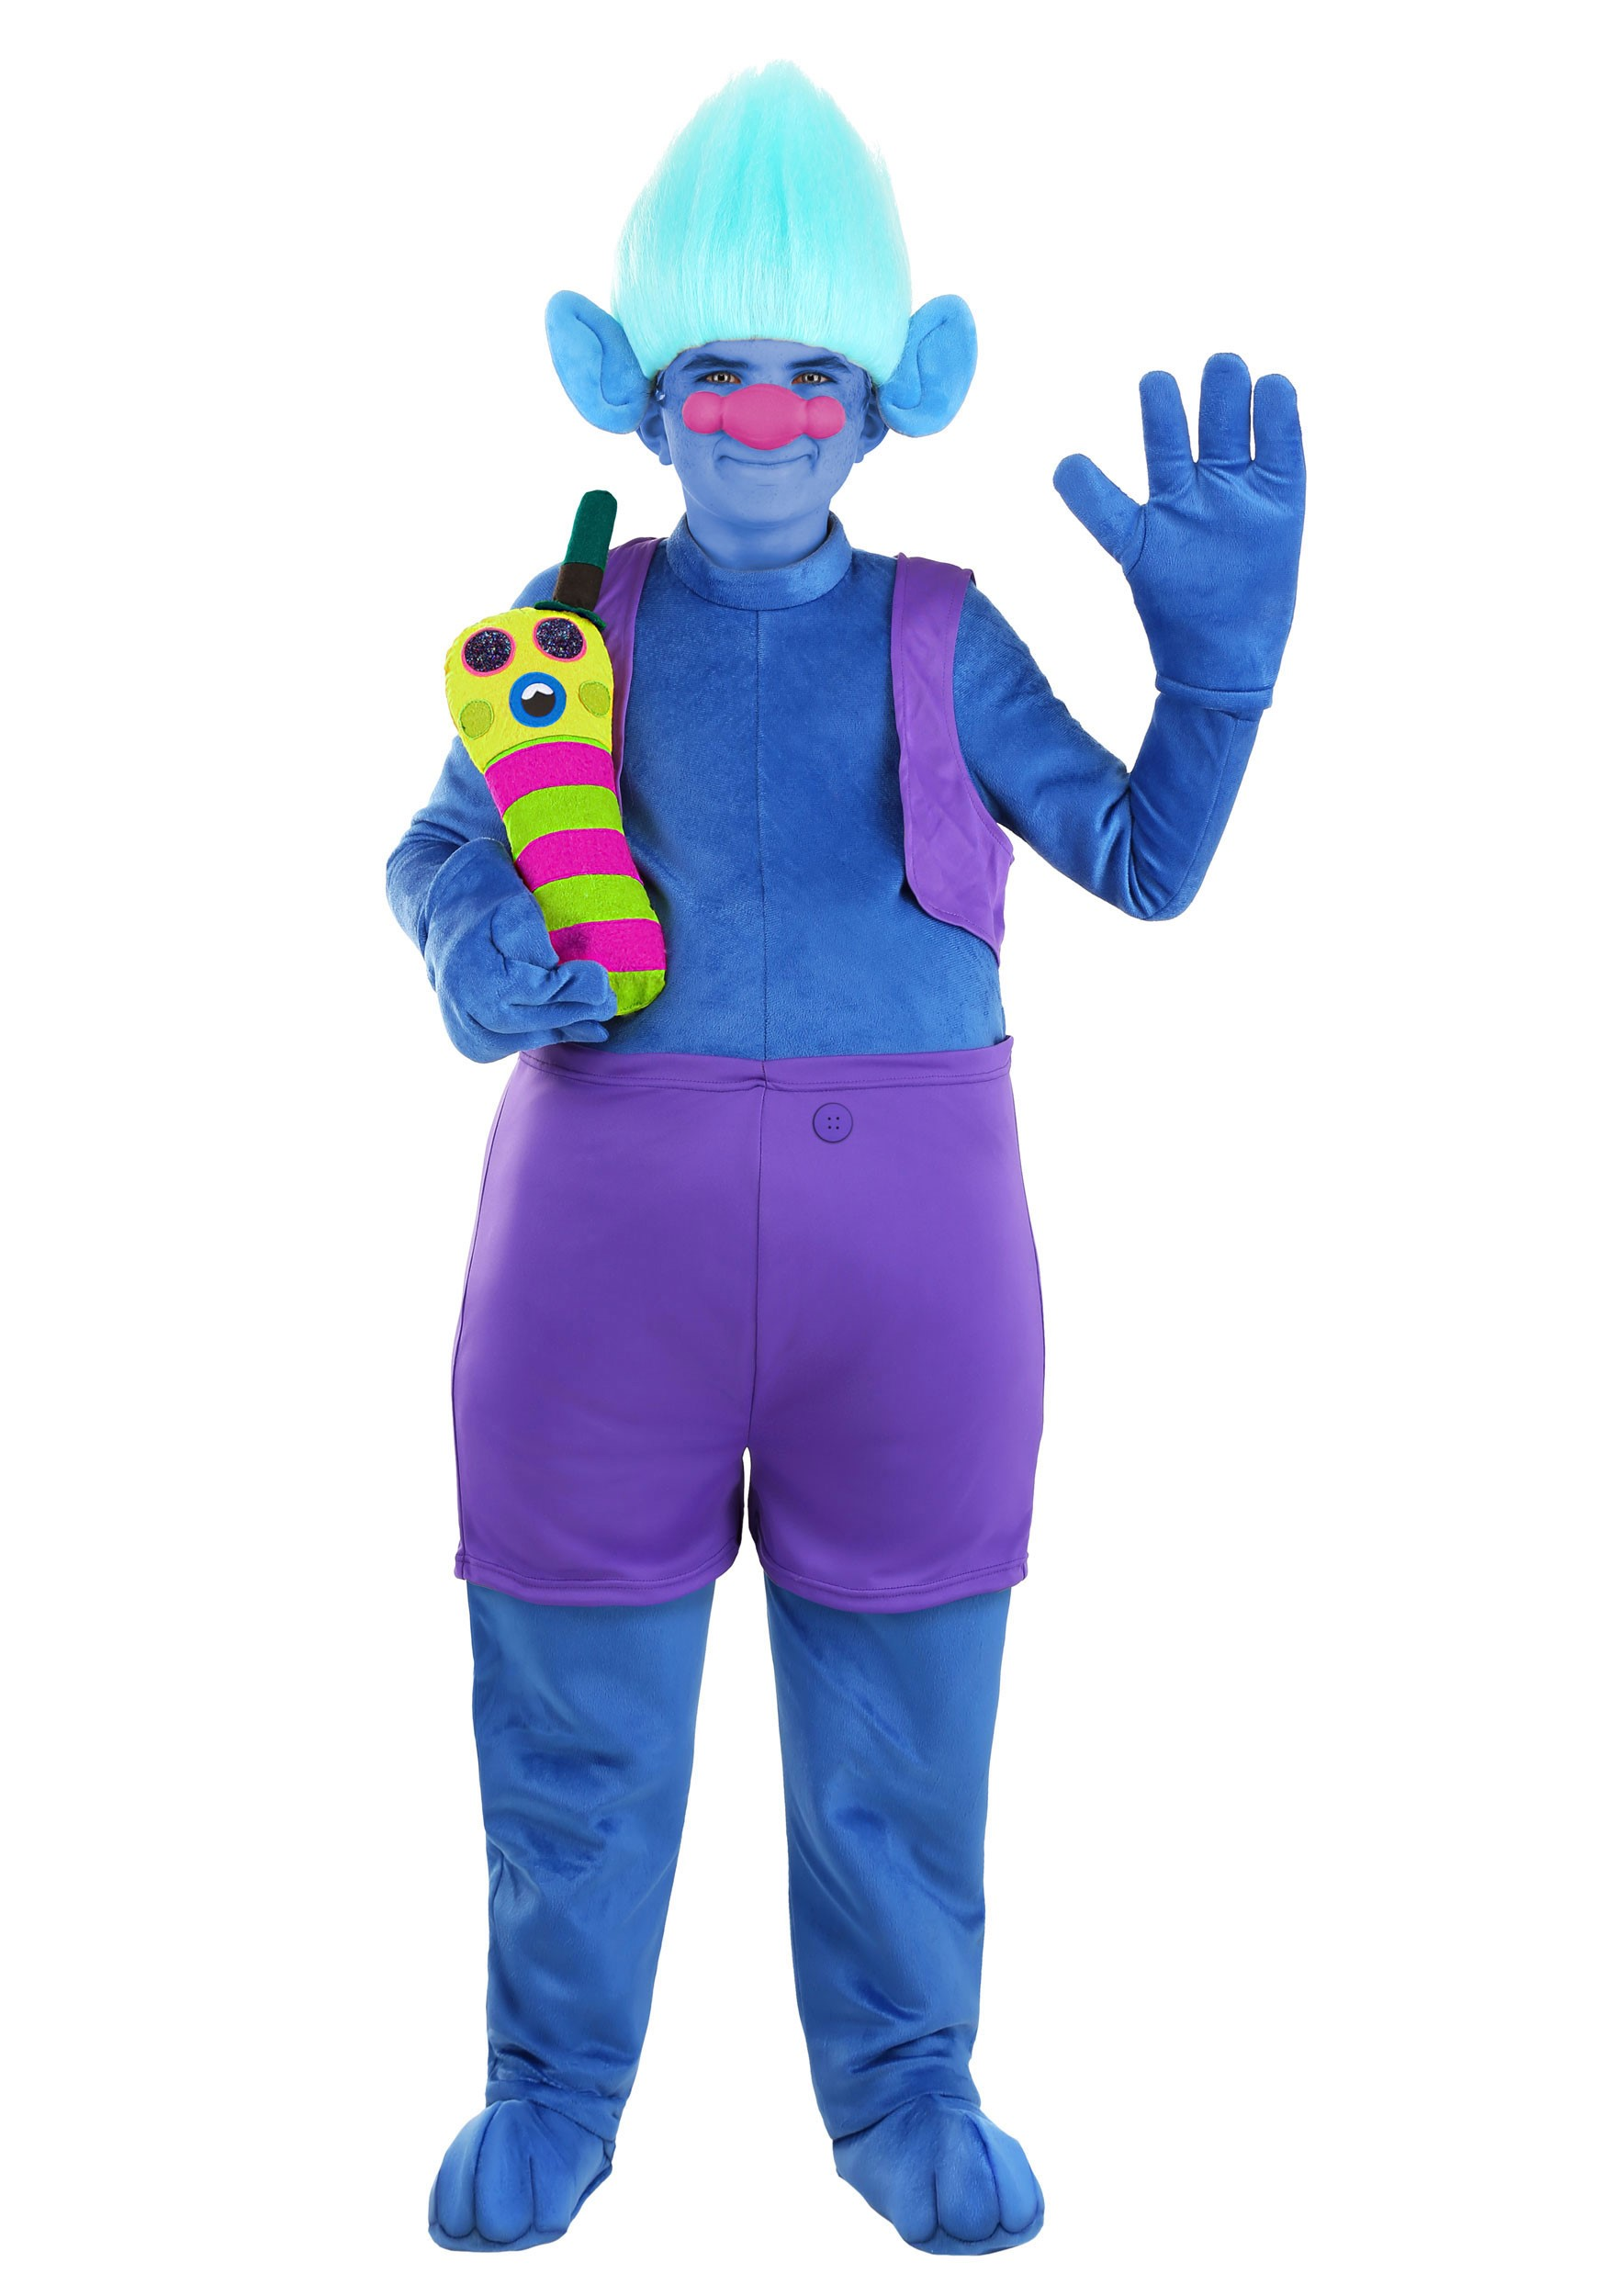 Biggie Costume from Trolls for Boys